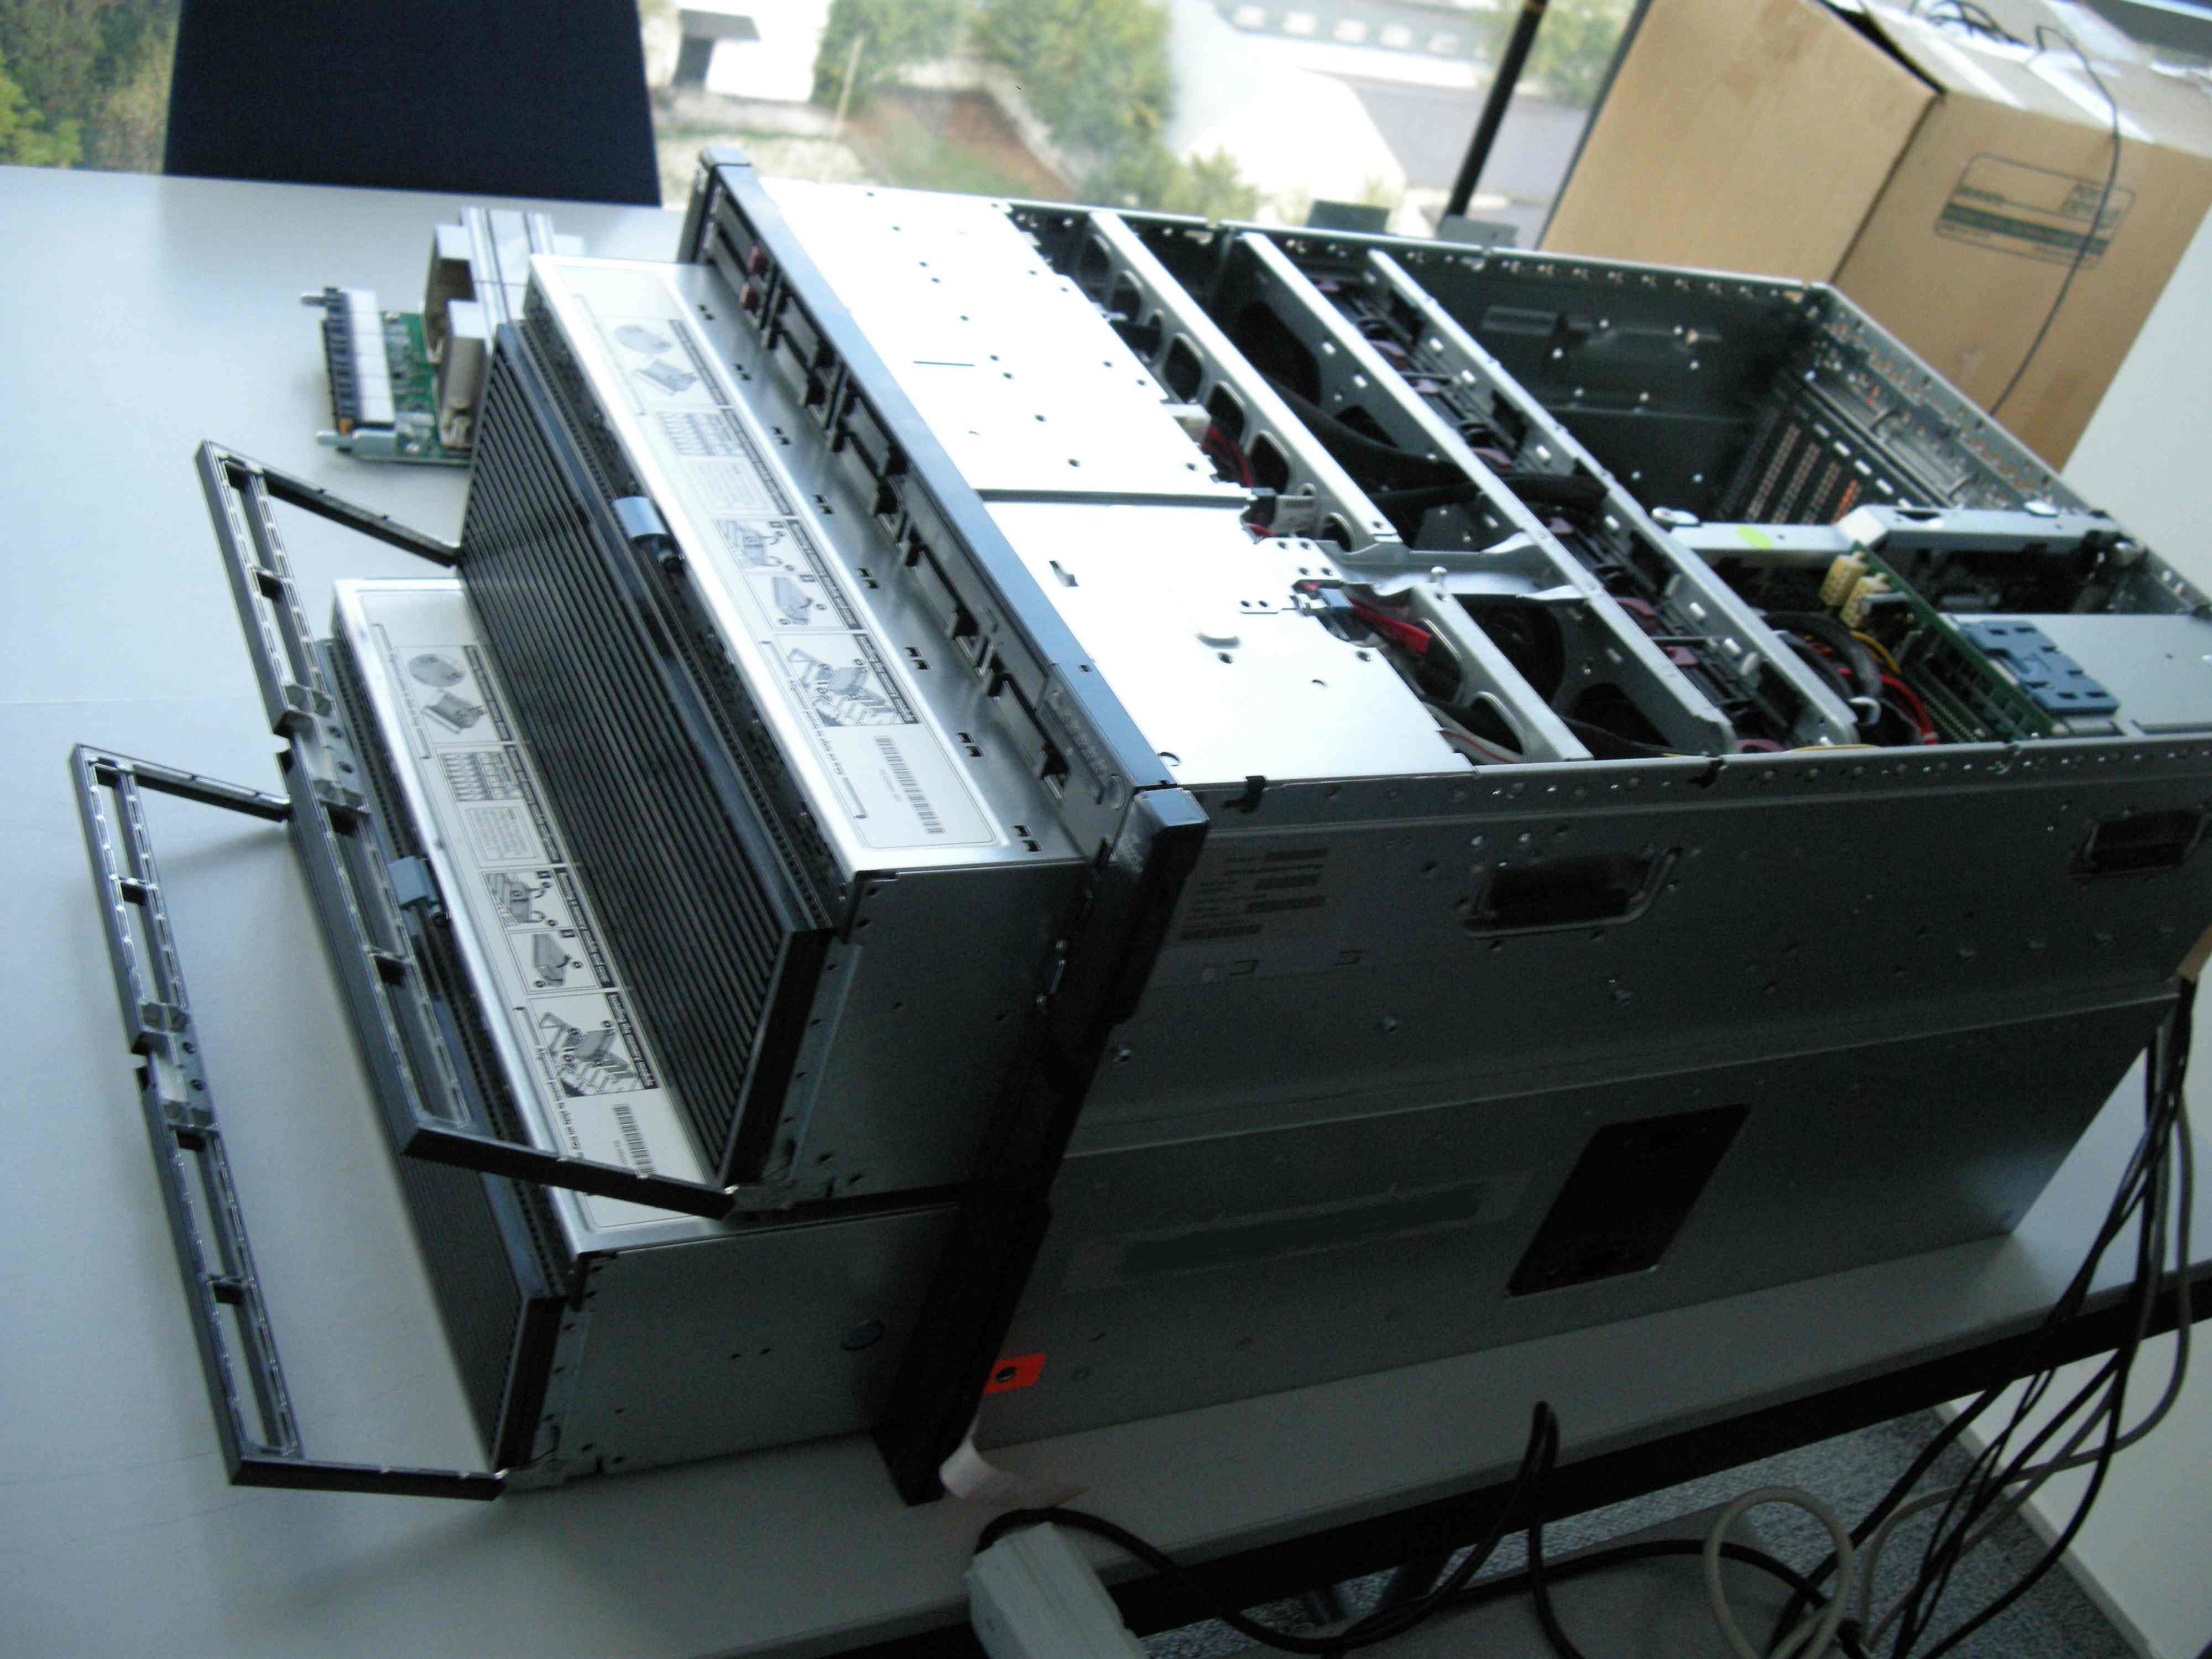 قیمت-سرور-HP-DL980-G7